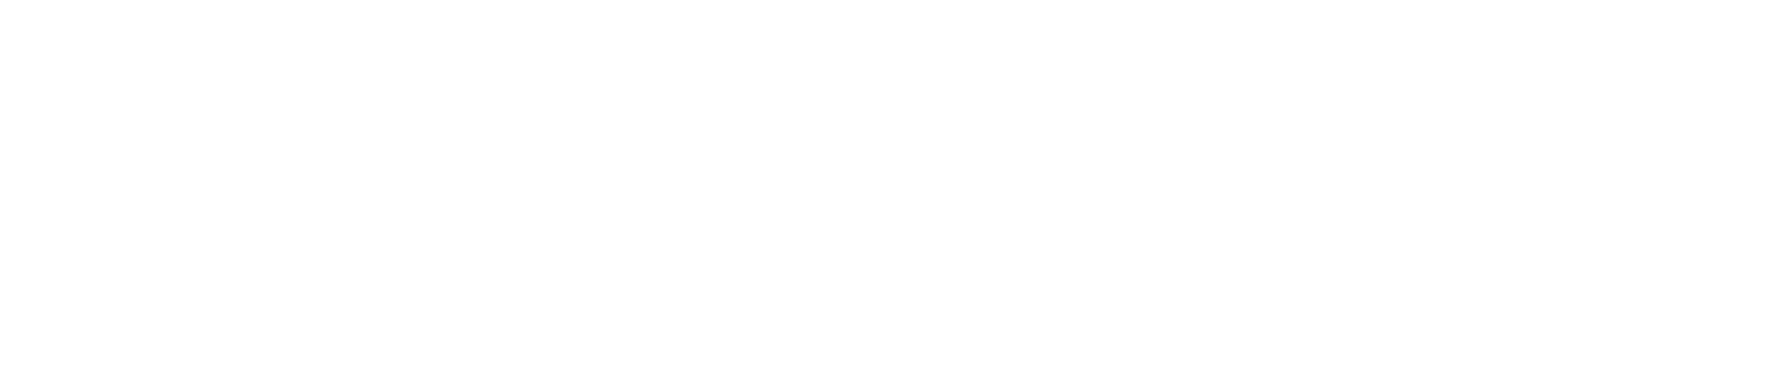 logo phosforea